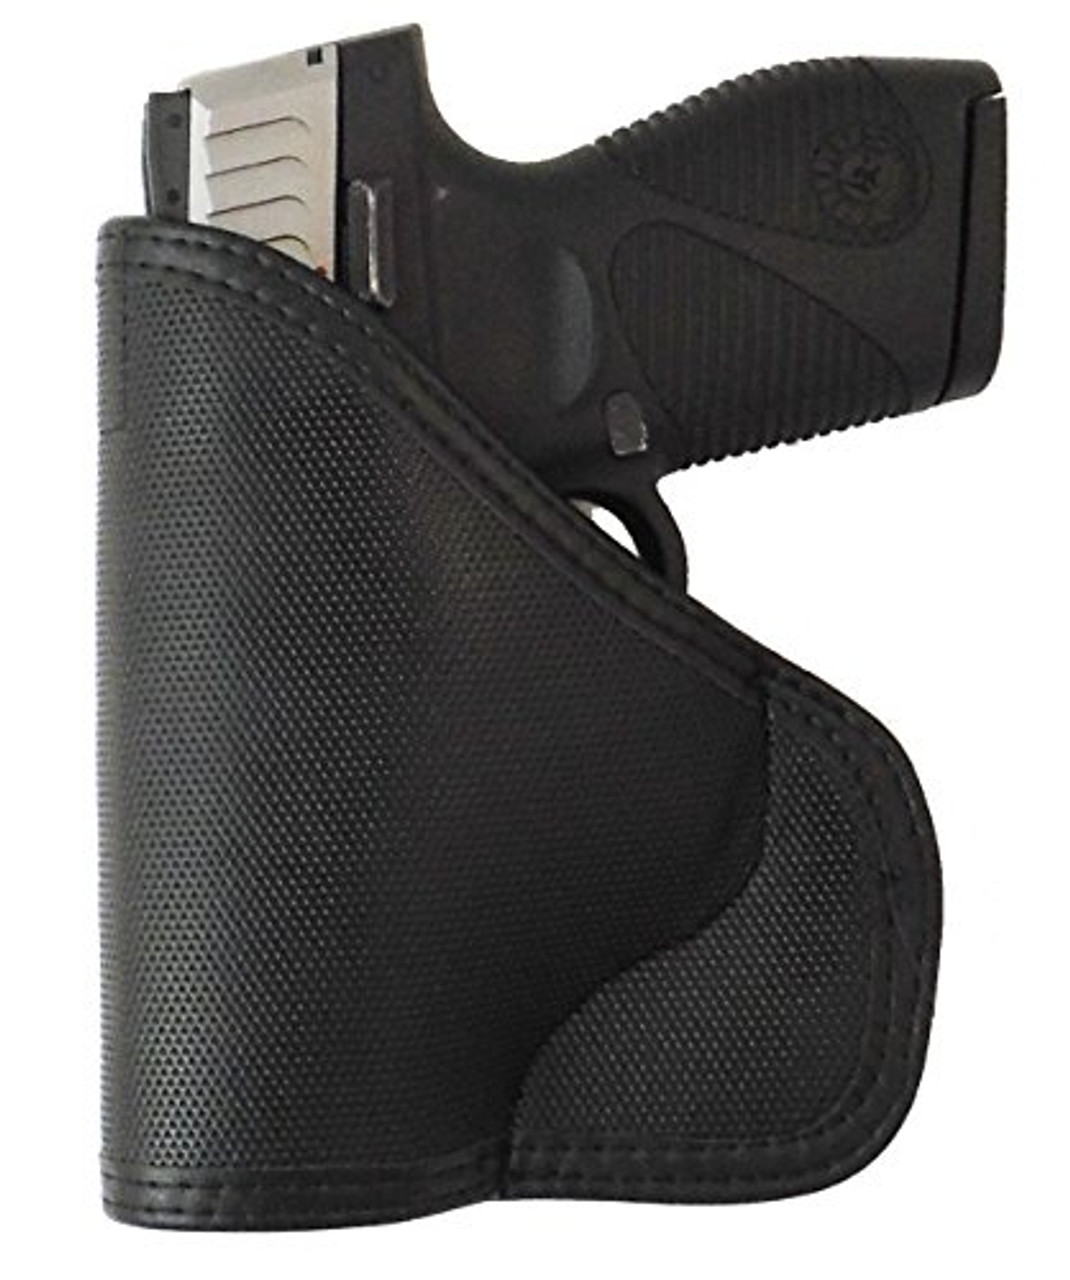 Taurus PT709 and PT740 Custom Fit Leather Trimmed orGUNizer Poly Pocket Holster For Concealed Carry Comfort (D)